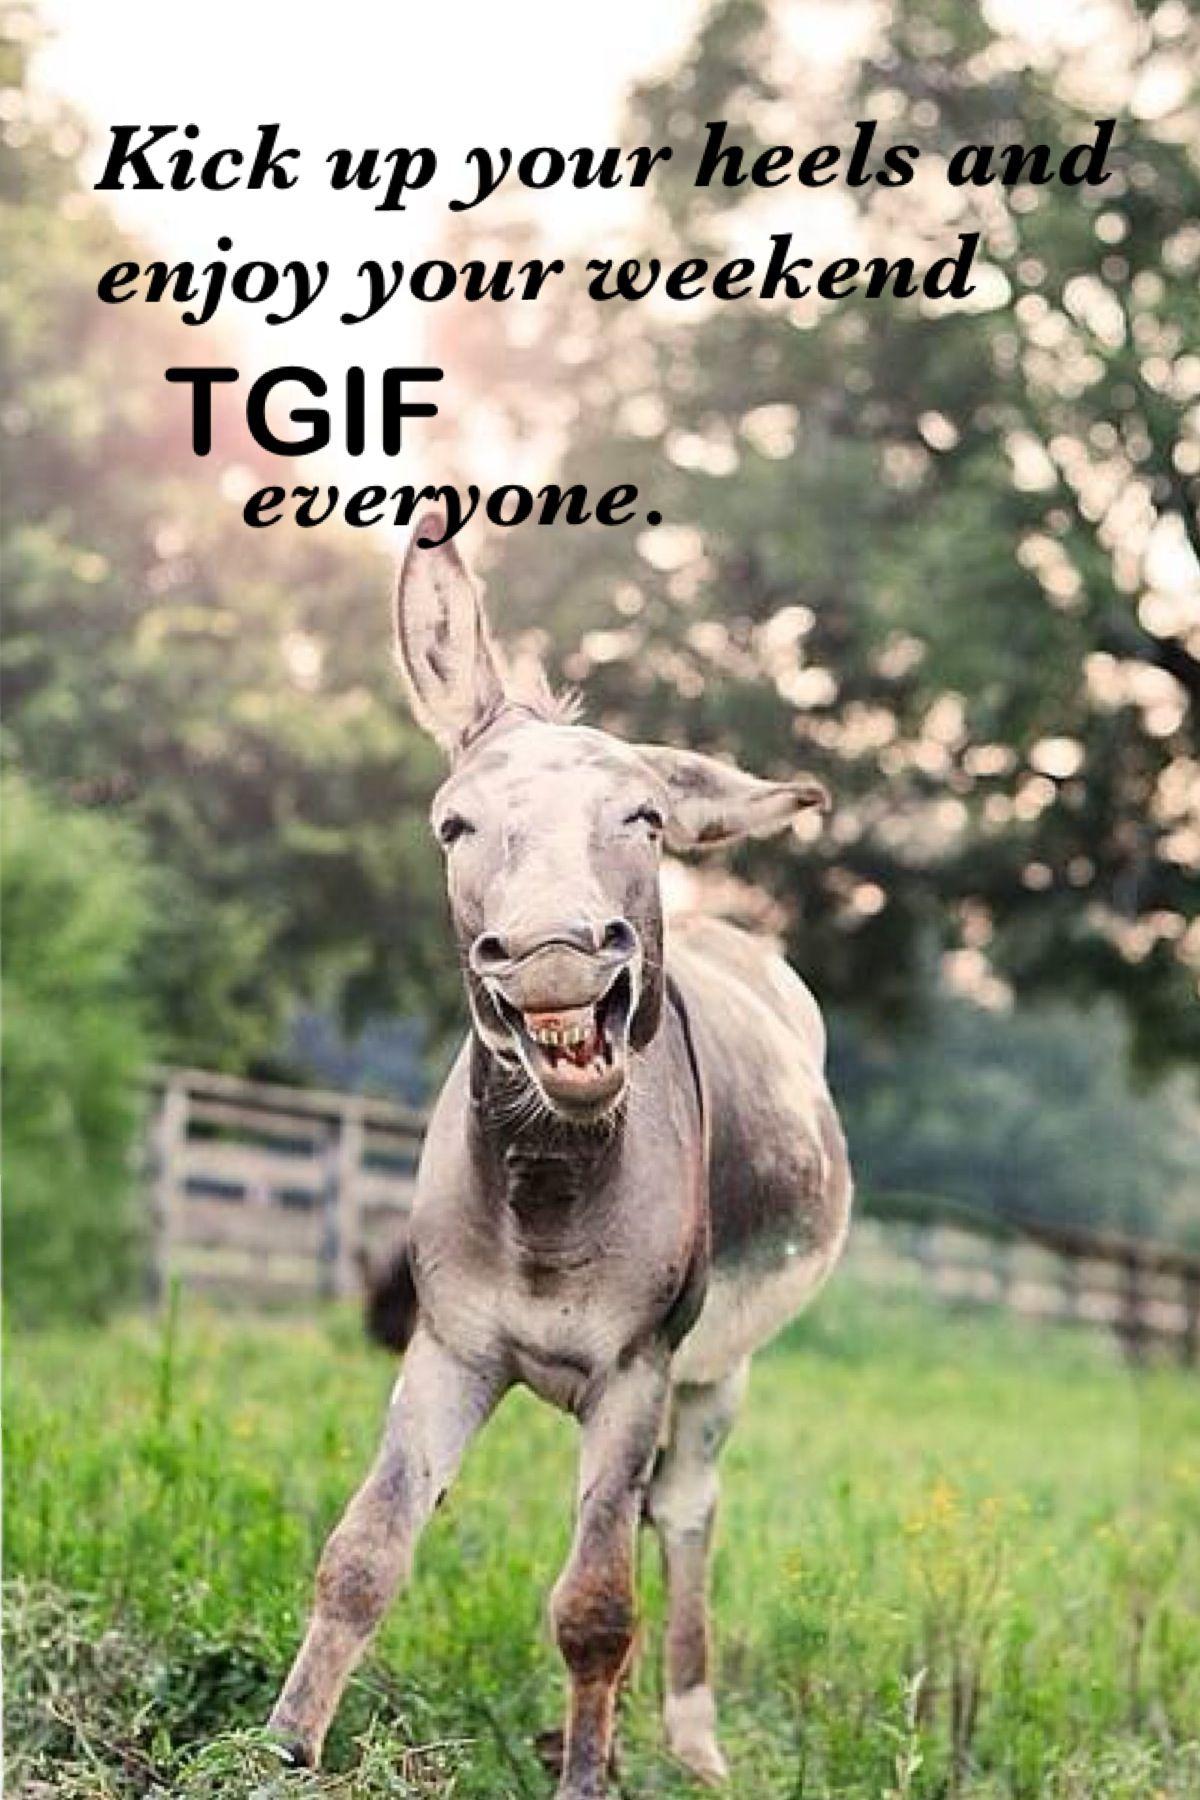 Funny donkey quotes hindi - photo#29